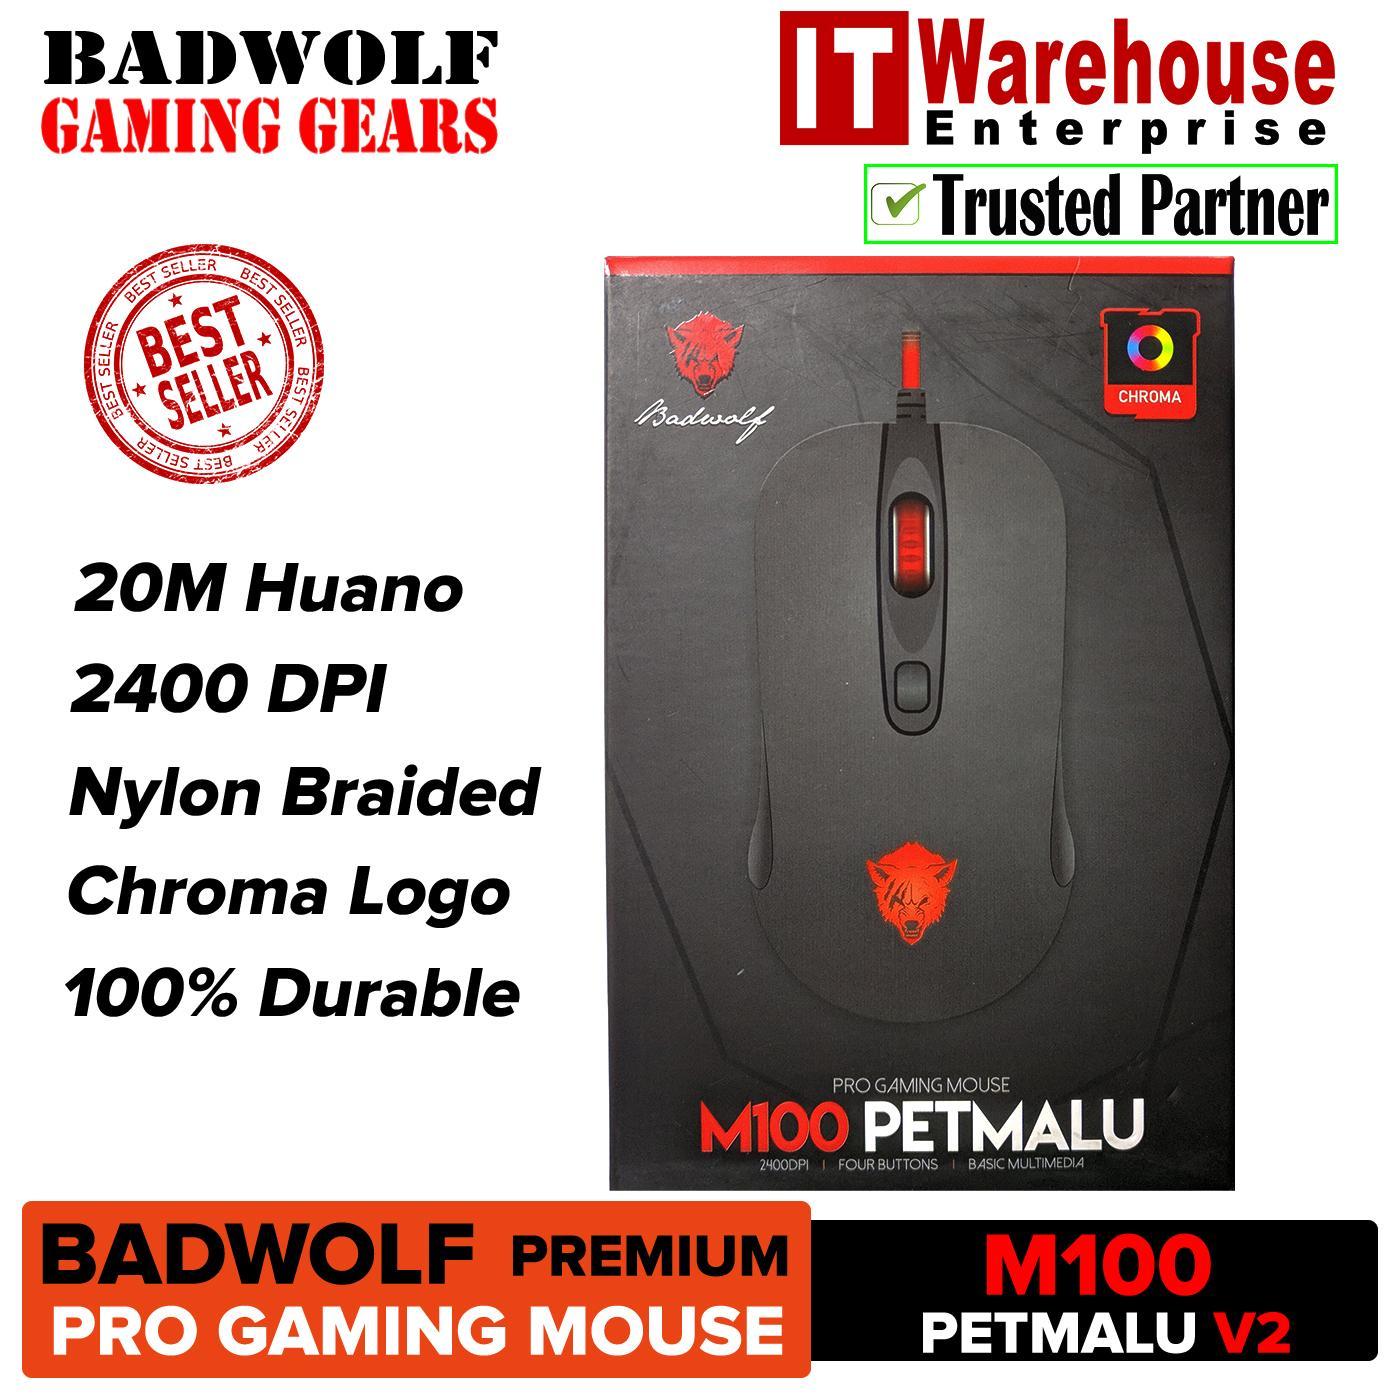 Badwolf Premium M100 Petmalu PRO V2 Gaming Mouse Chroma Lights for Gamers  Version 2 - Badwolf